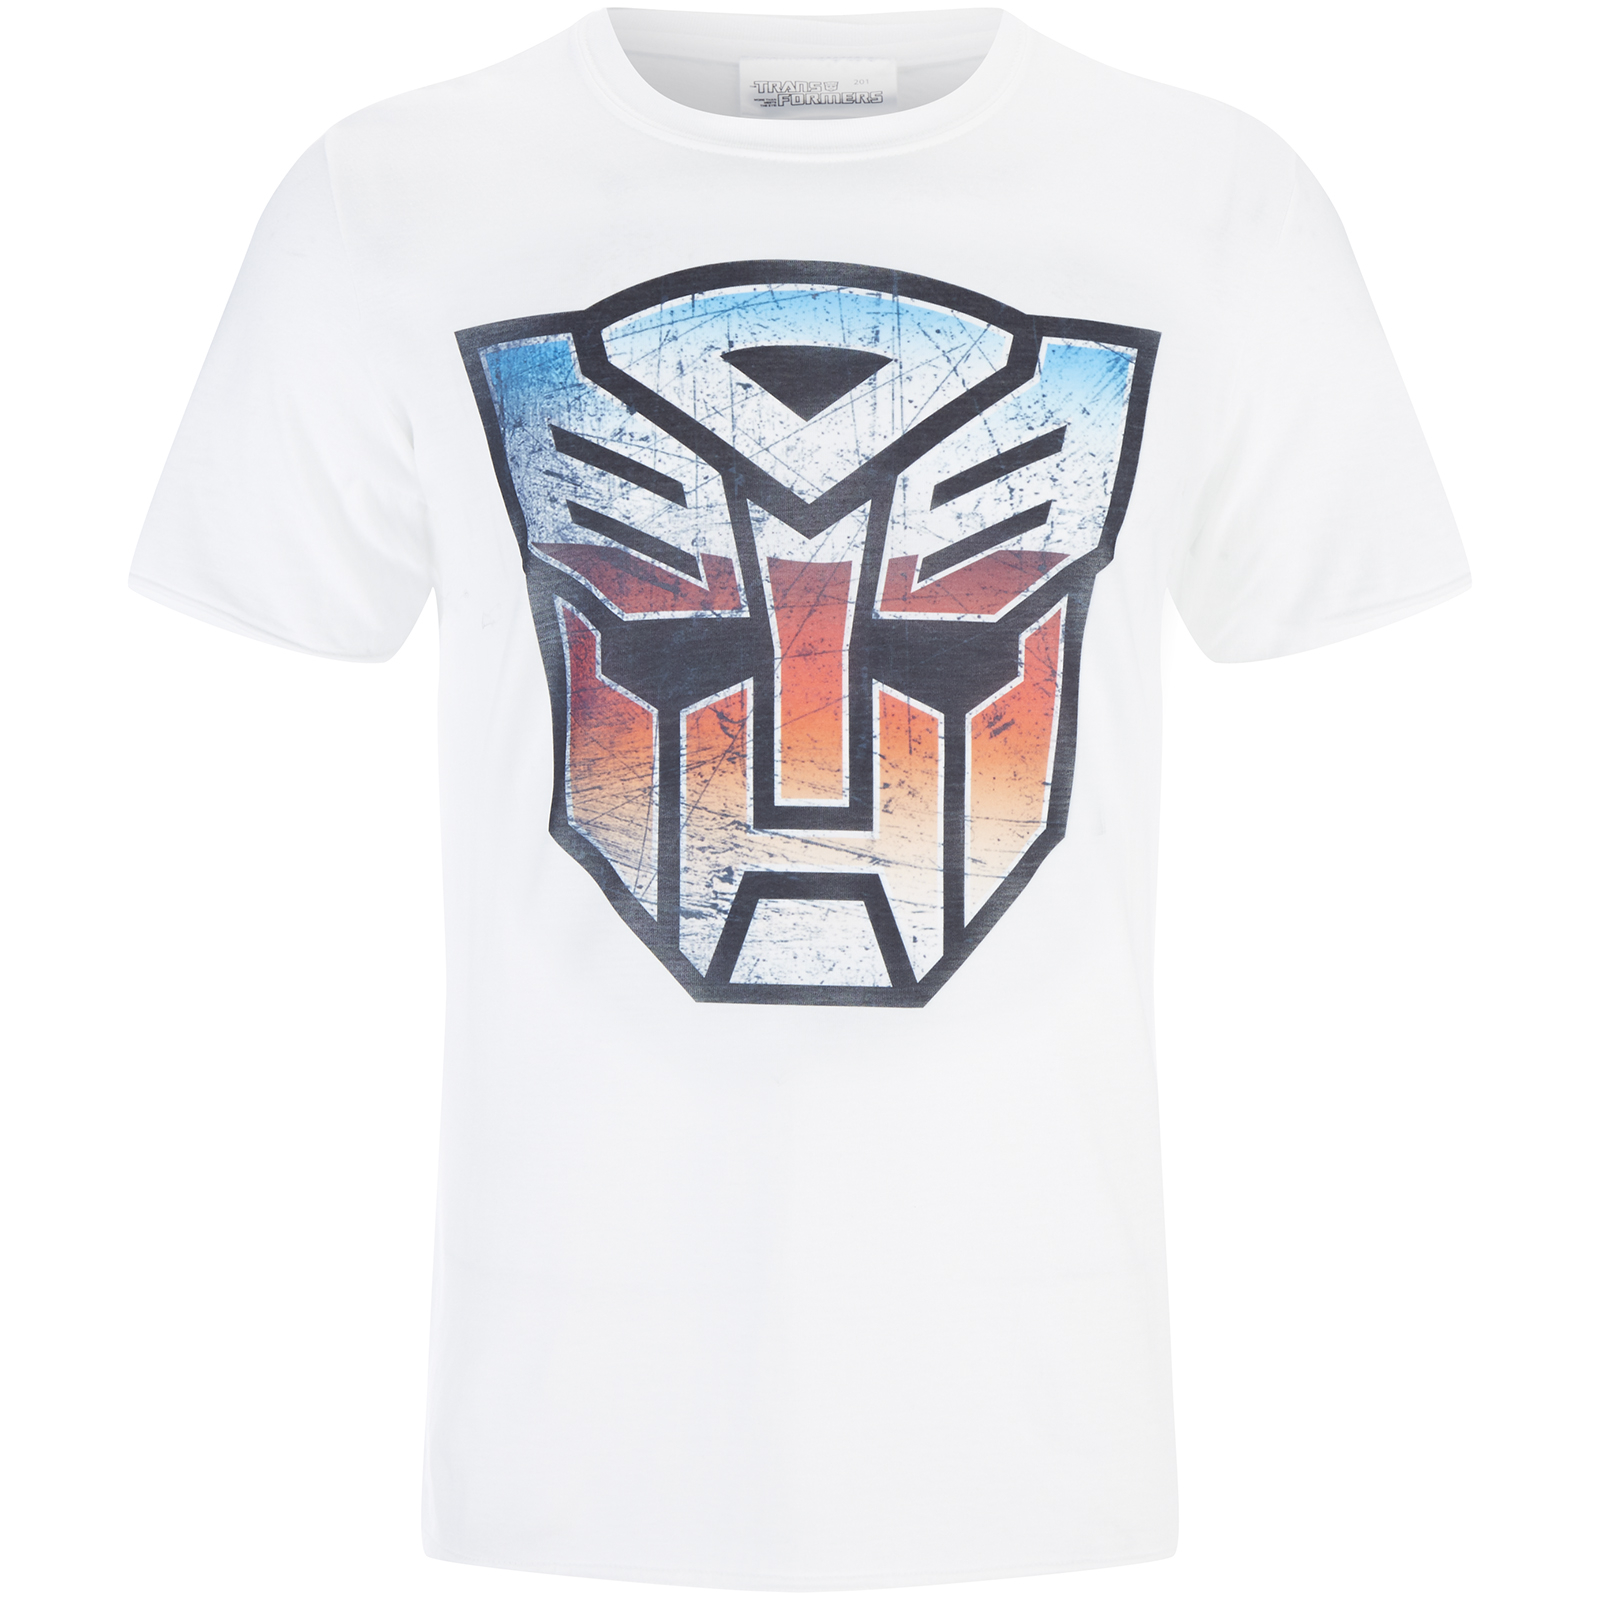 Transformers Men's Transformers Multi Emblem T-Shirt - White - M - Bianco